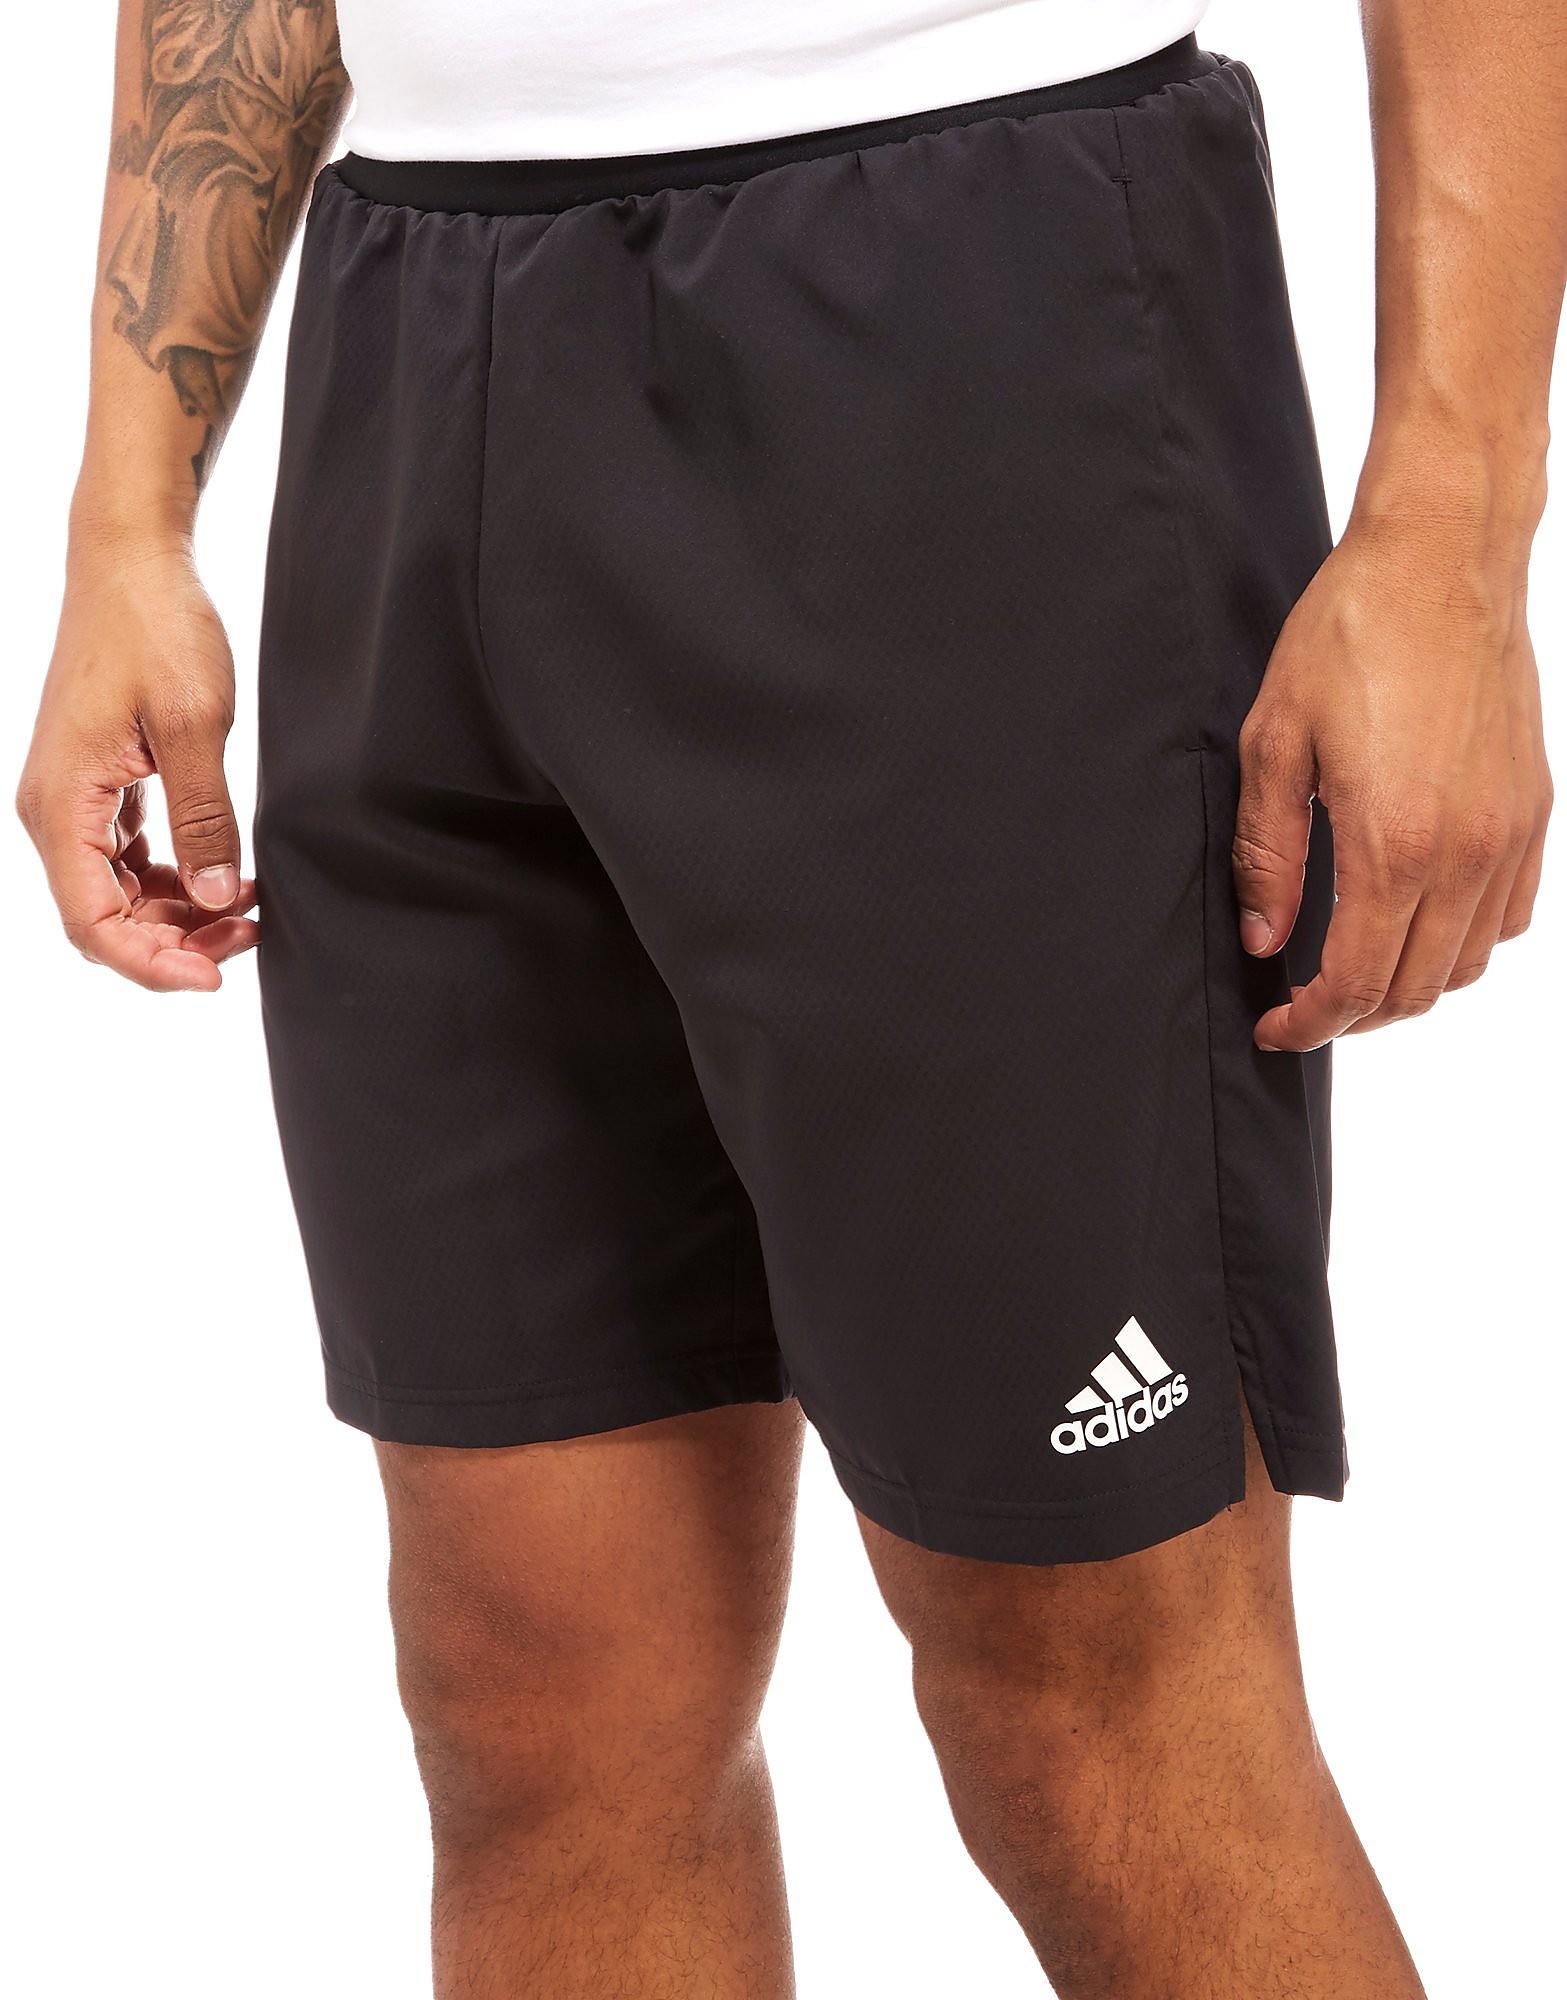 adidas Tango Shorts